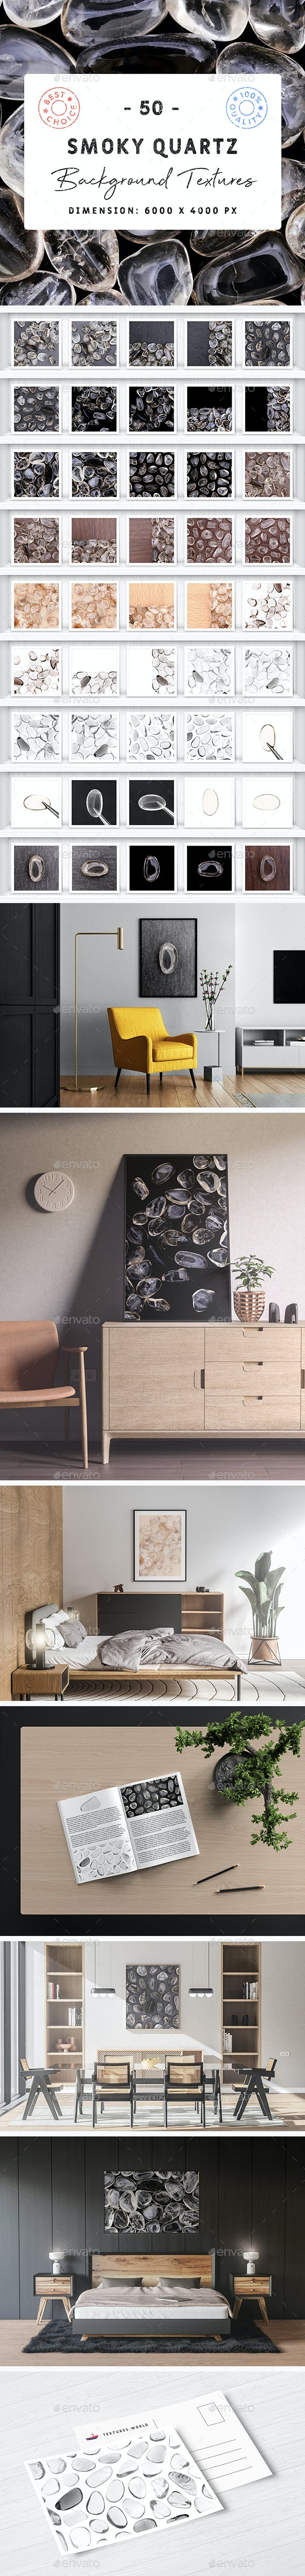 50 Smoky Quartz Background Textures - 3DOcean Item for Sale